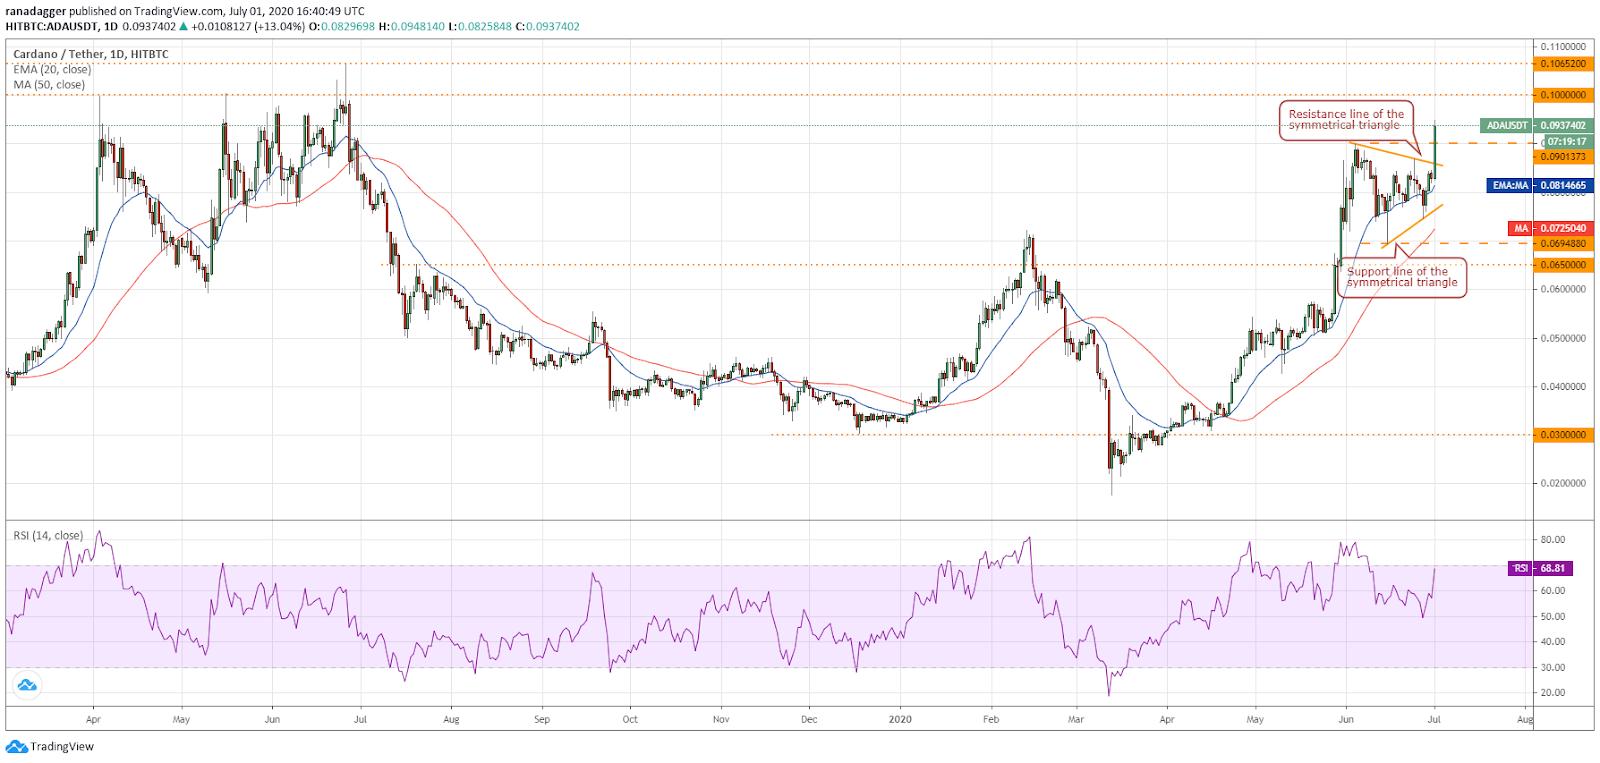 ADA/USD daily chart. Source: Tradingview